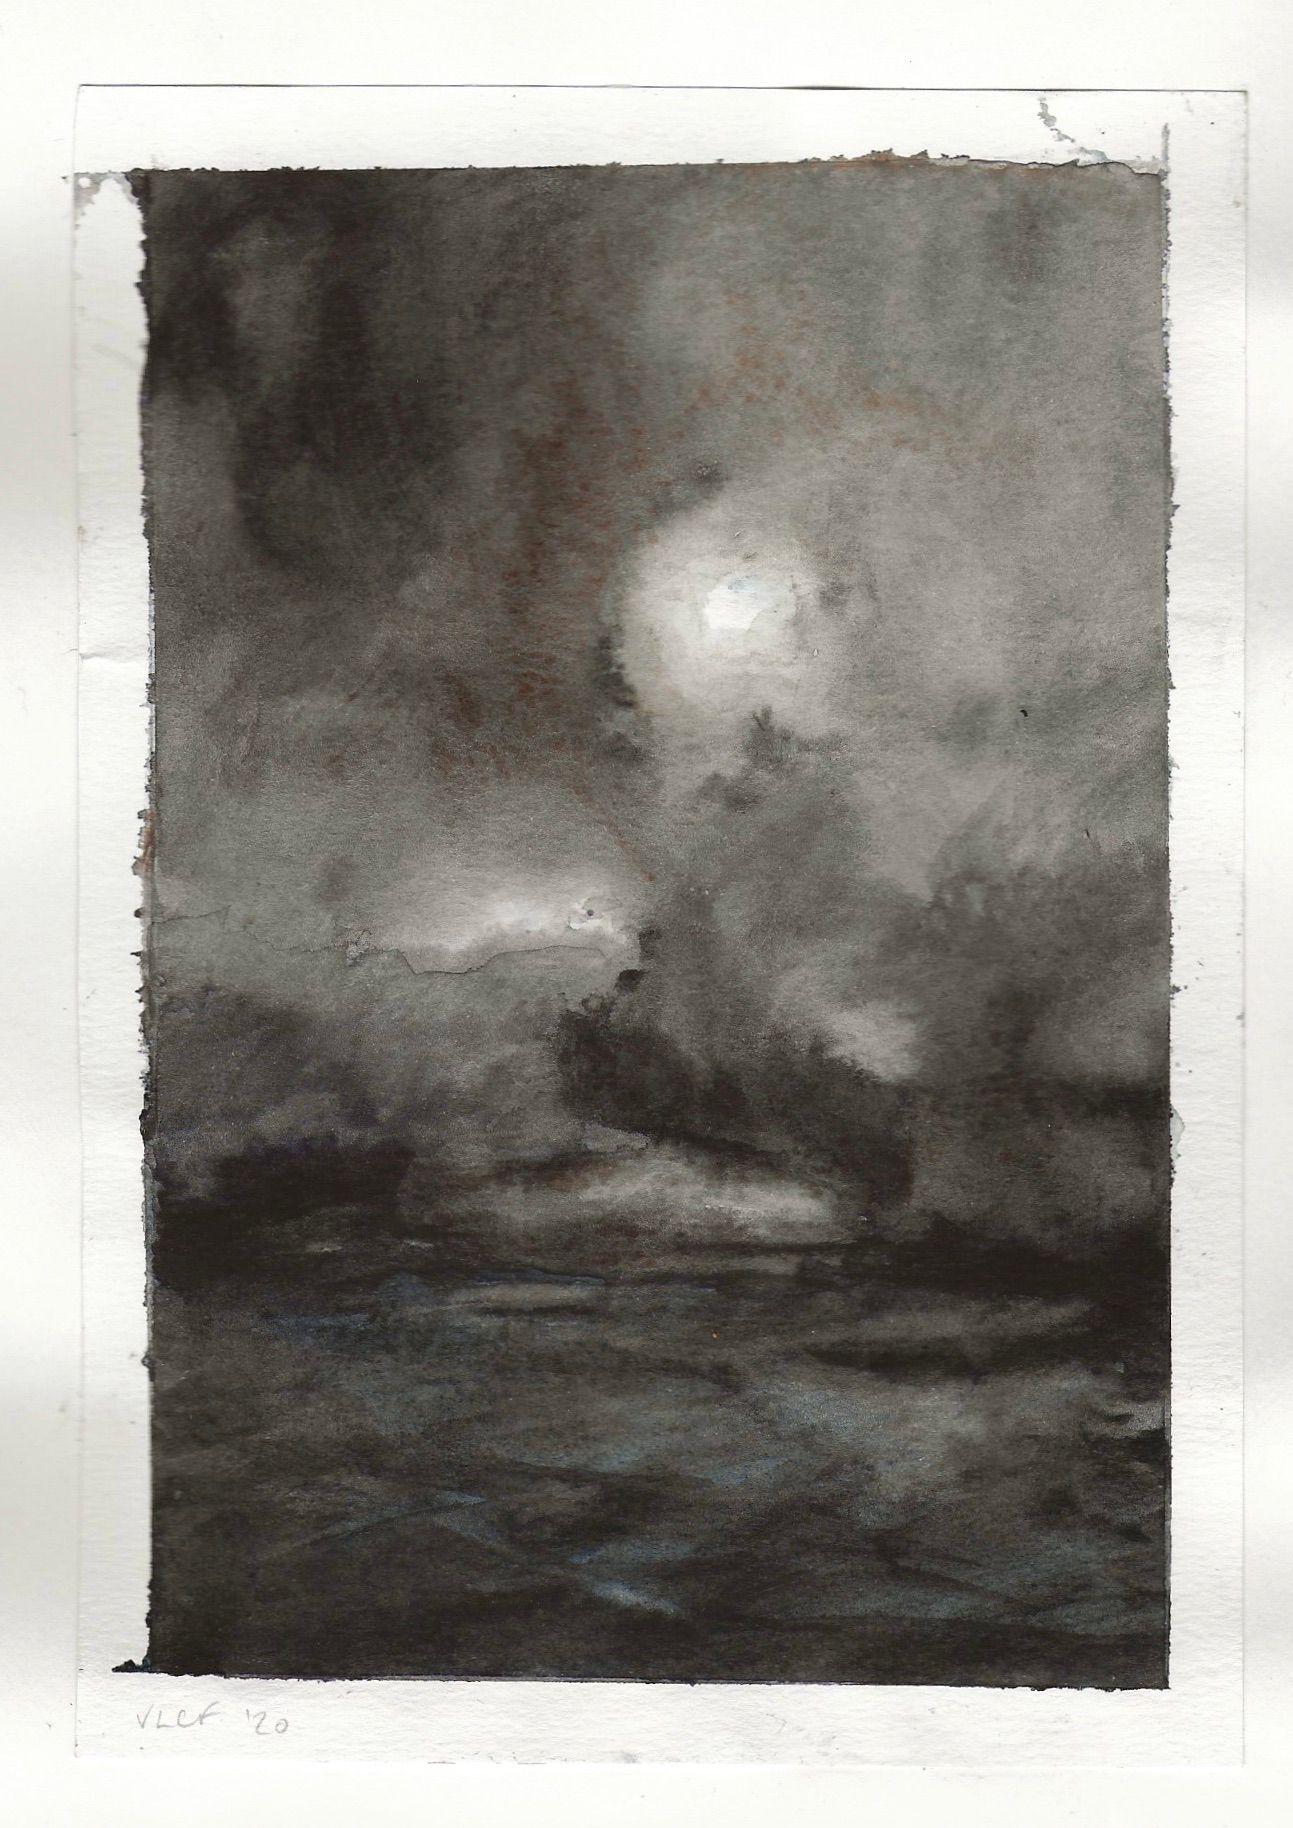 watercolour studies - #11 - watercolour - 148 x 210mm - 200gsm 120lb